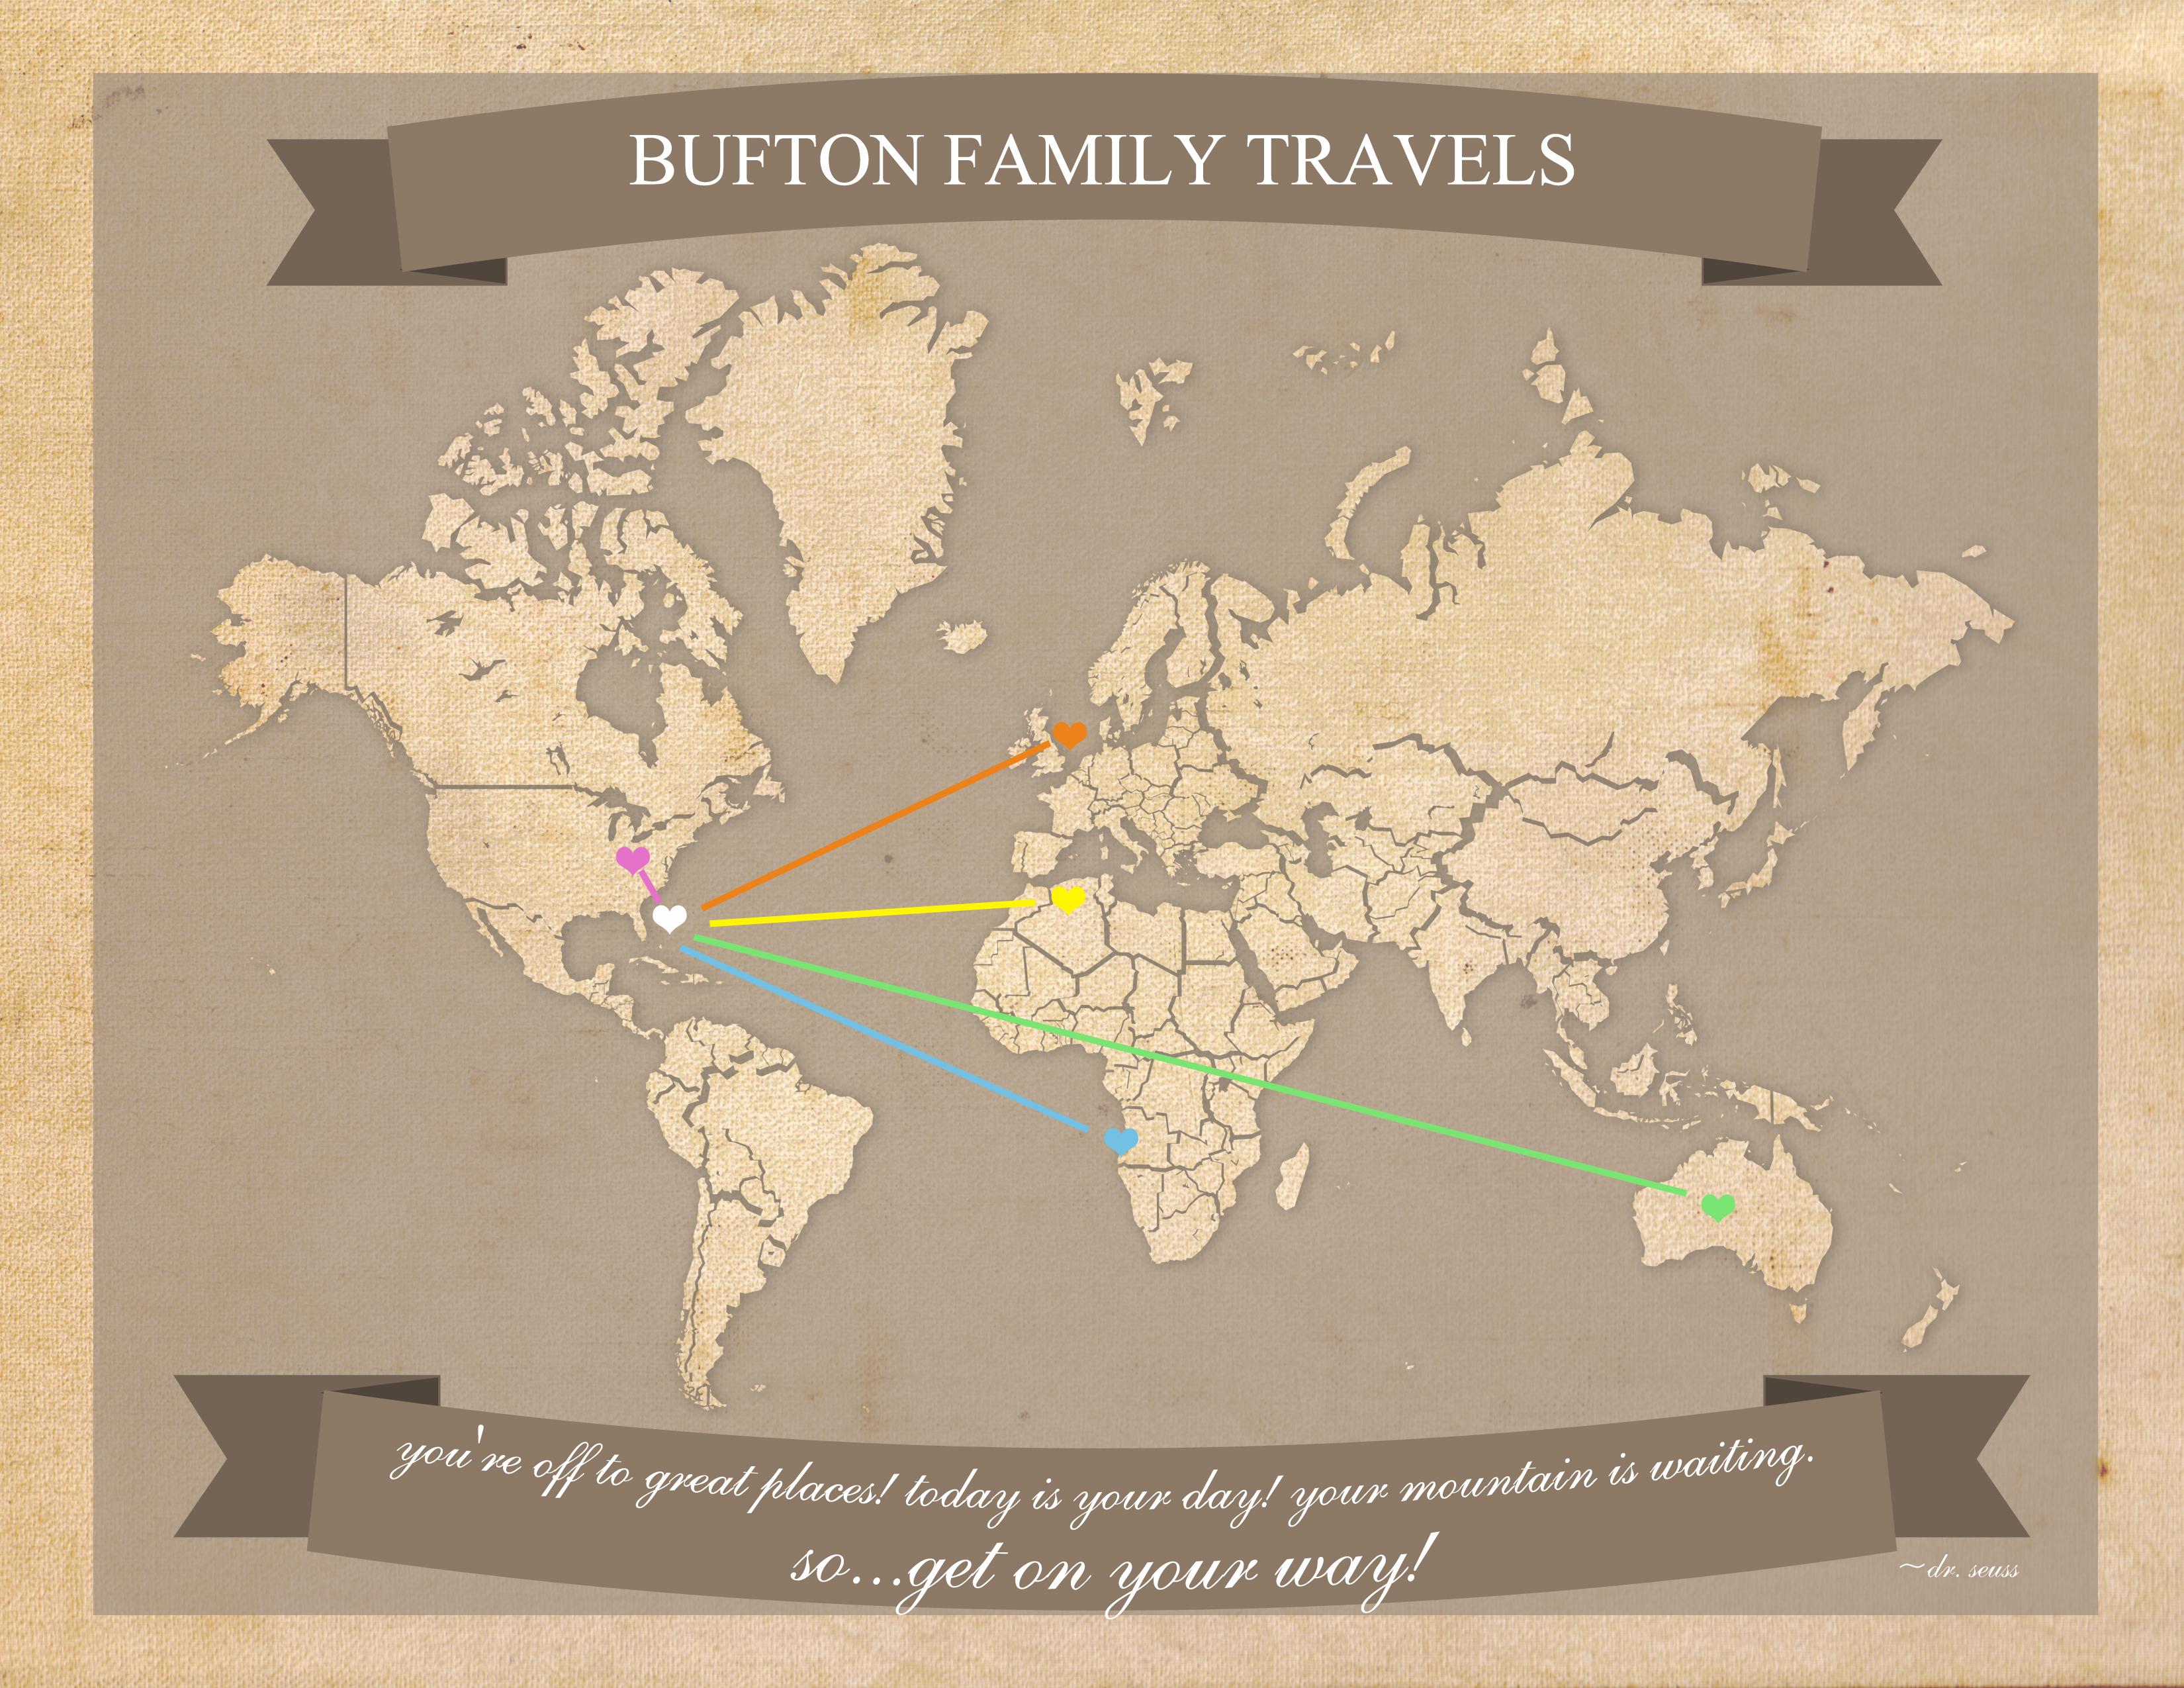 Free Printable World Travel Map - Free Printable Maps